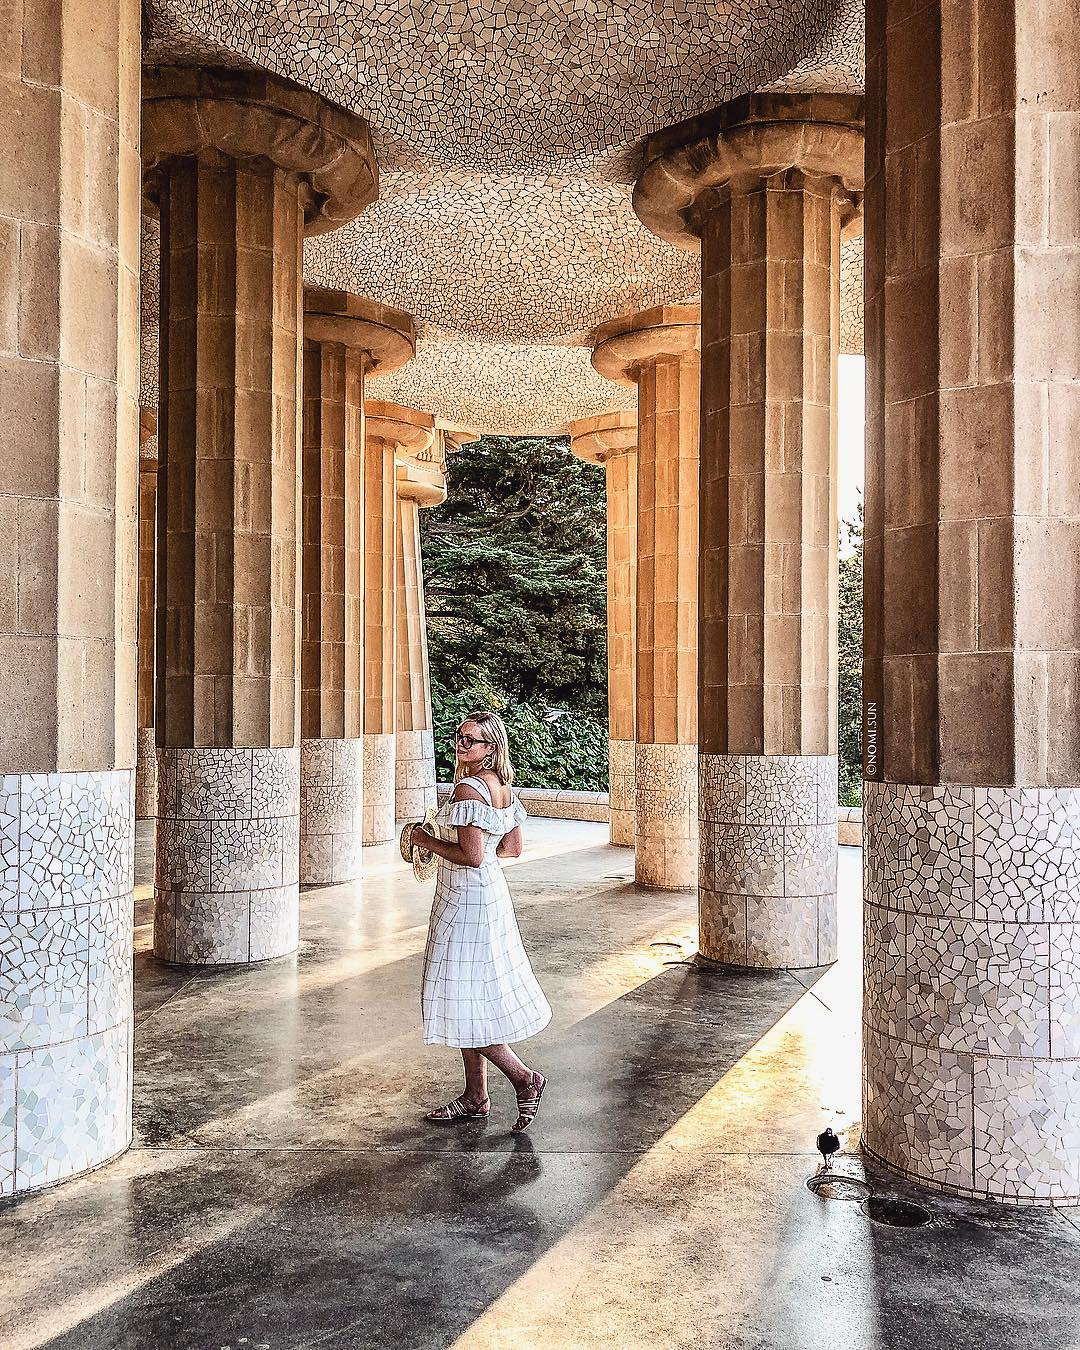 Barcelona Walking Tour: Park Gaudi